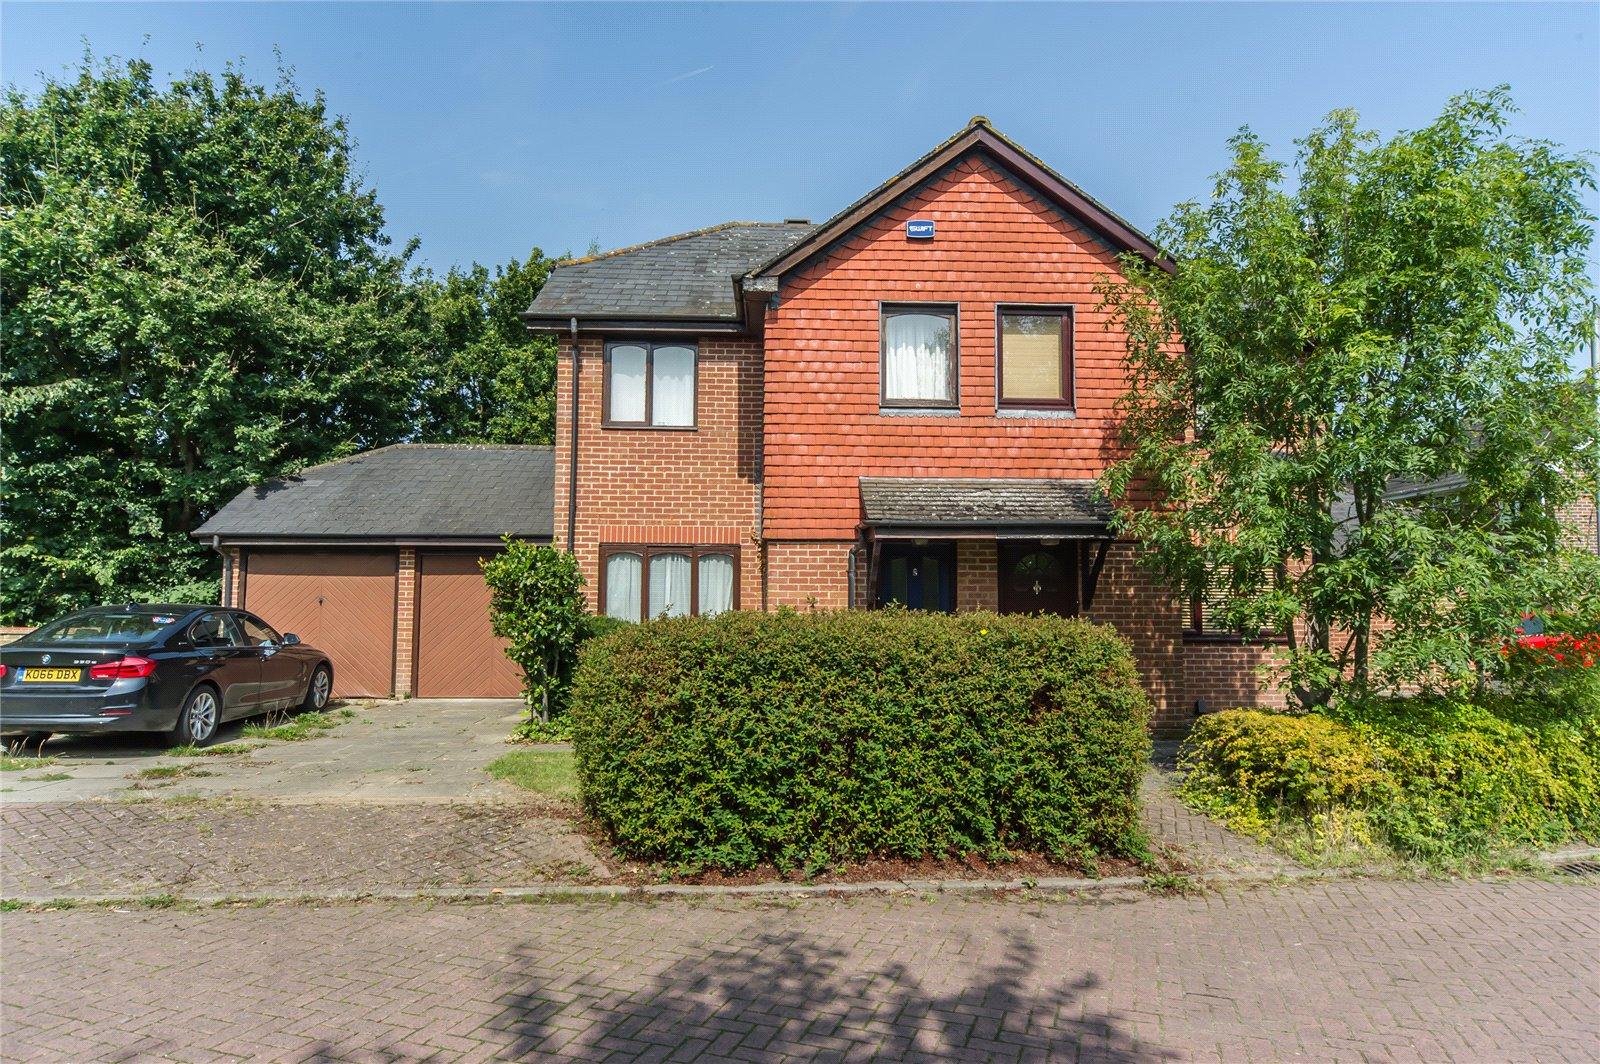 Amberley Close, Tonbridge, Kent, TN9